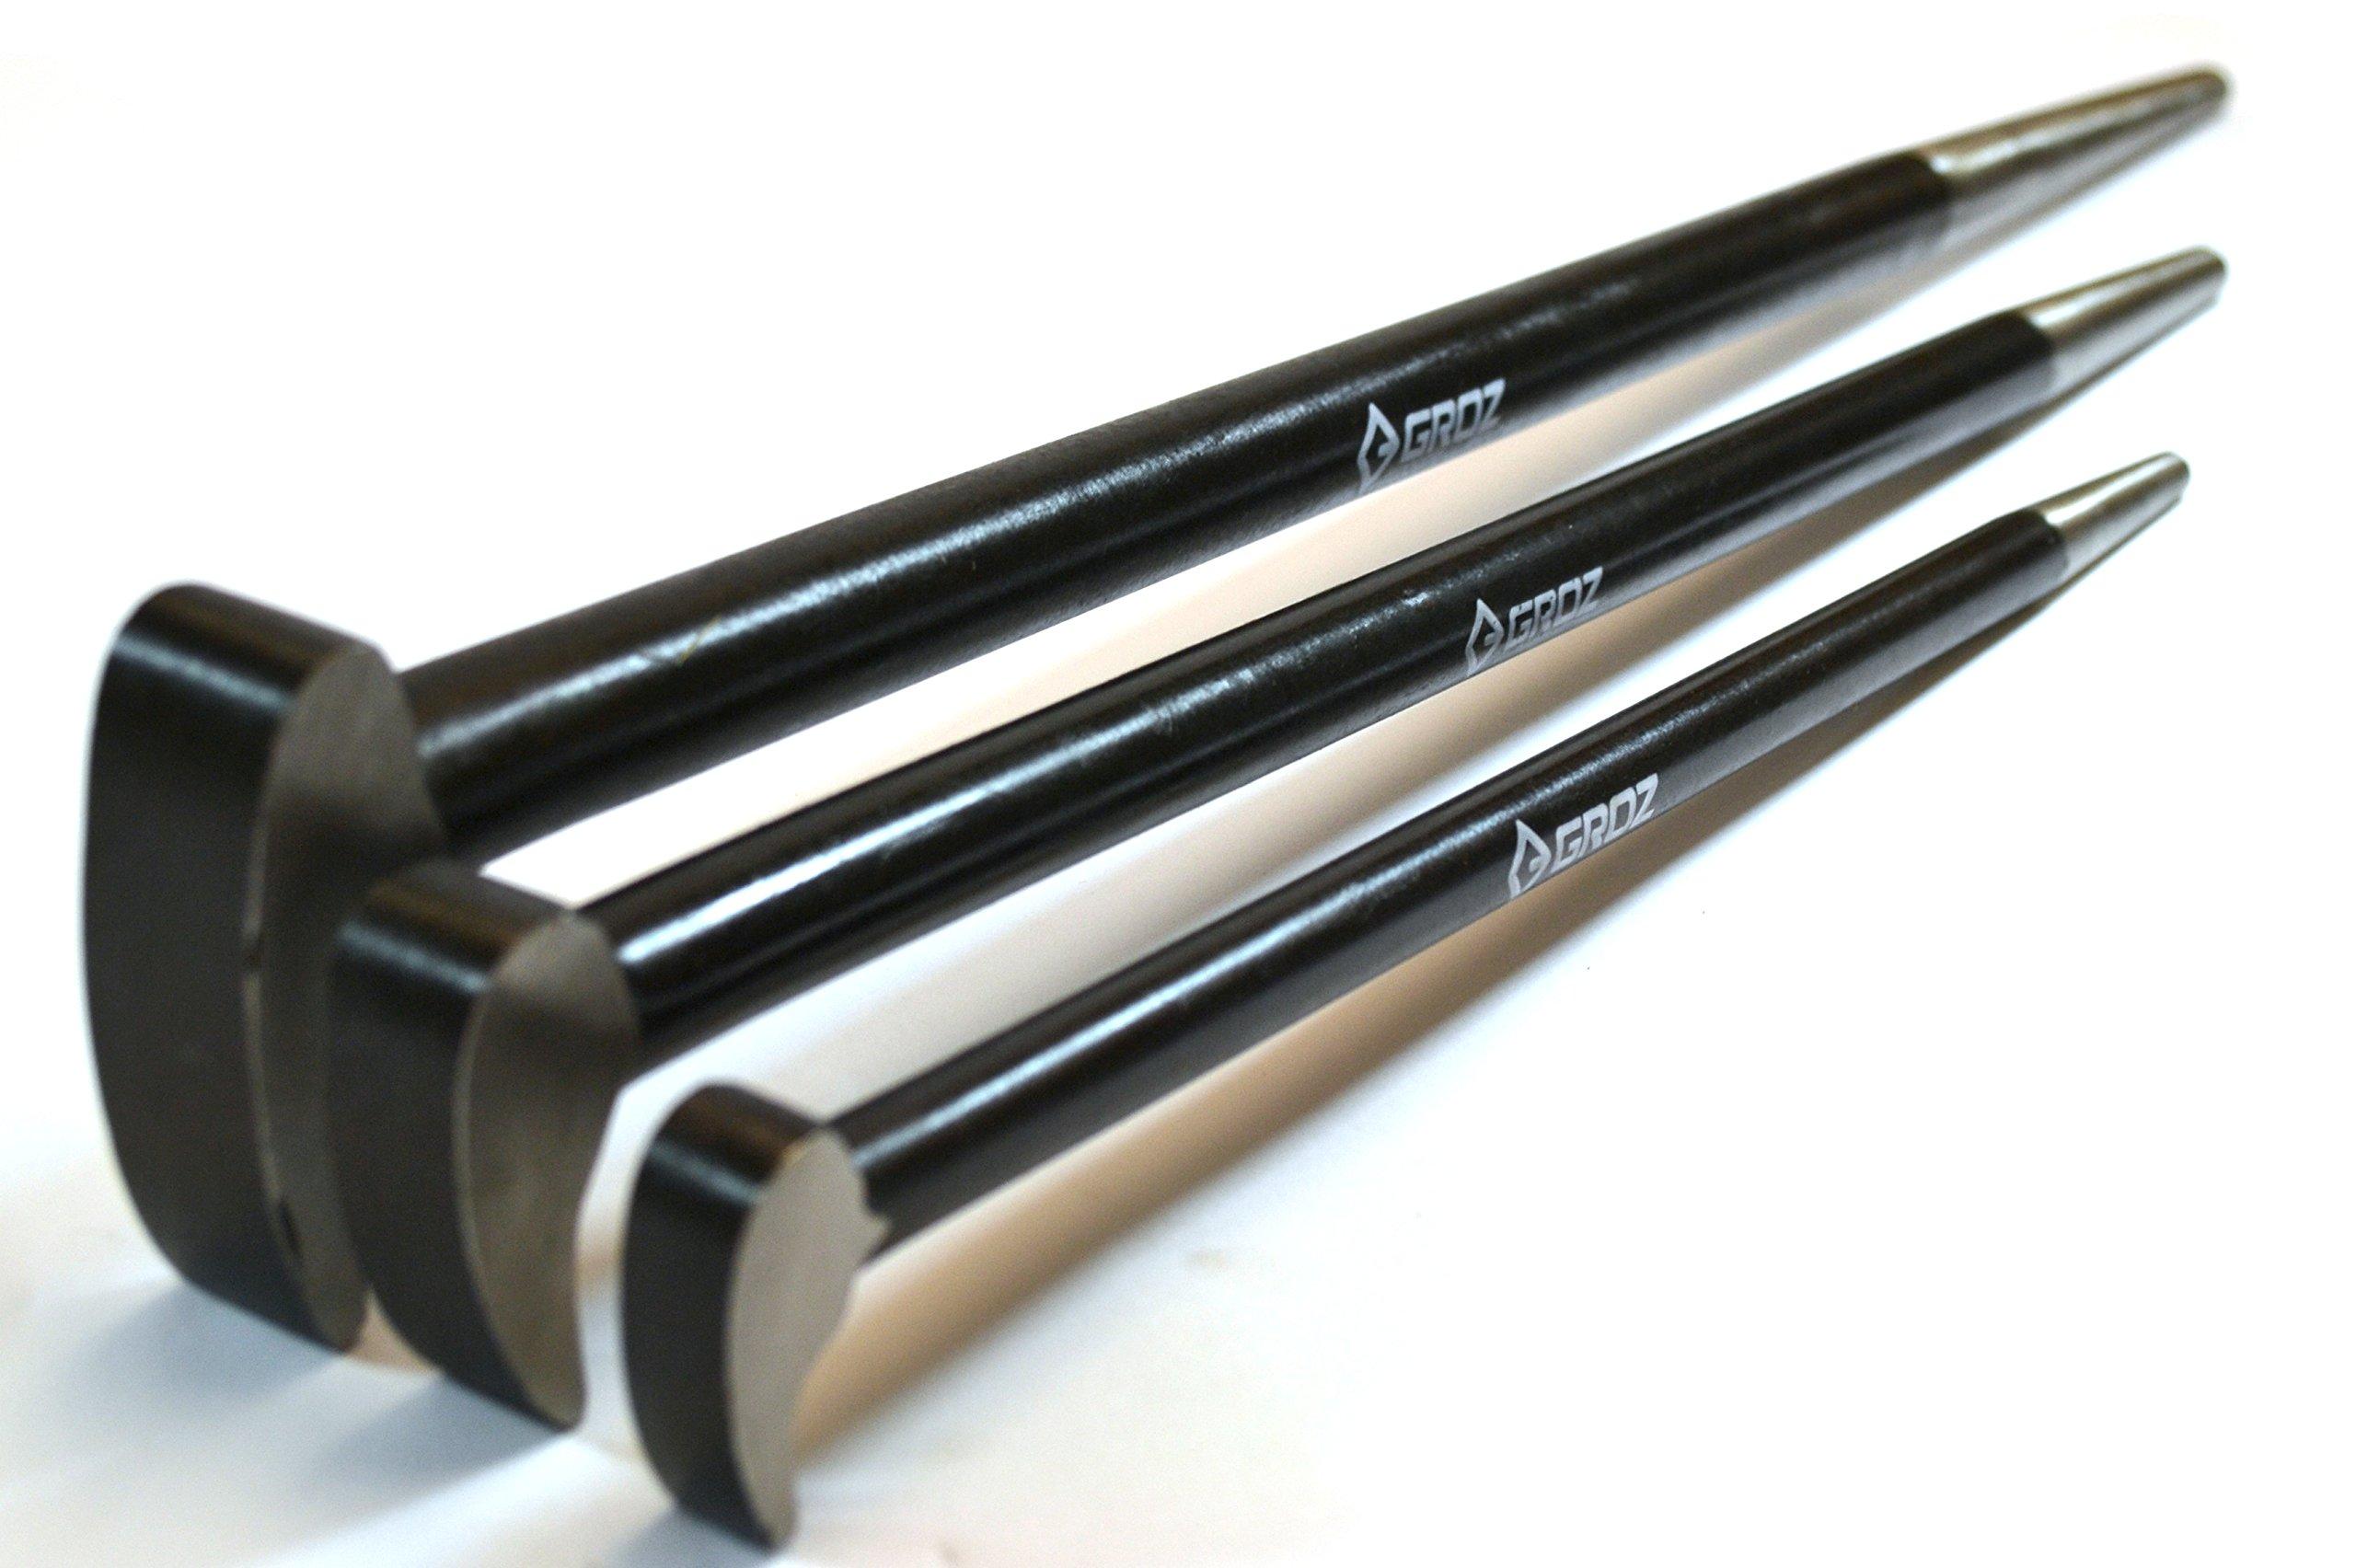 Groz 33155 Industrial Series, Heavy Duty Roll Head Pry Bar Forged Chrome Vanadium Steel (38 - 43 Hrc), 20'' L, 3 Piece